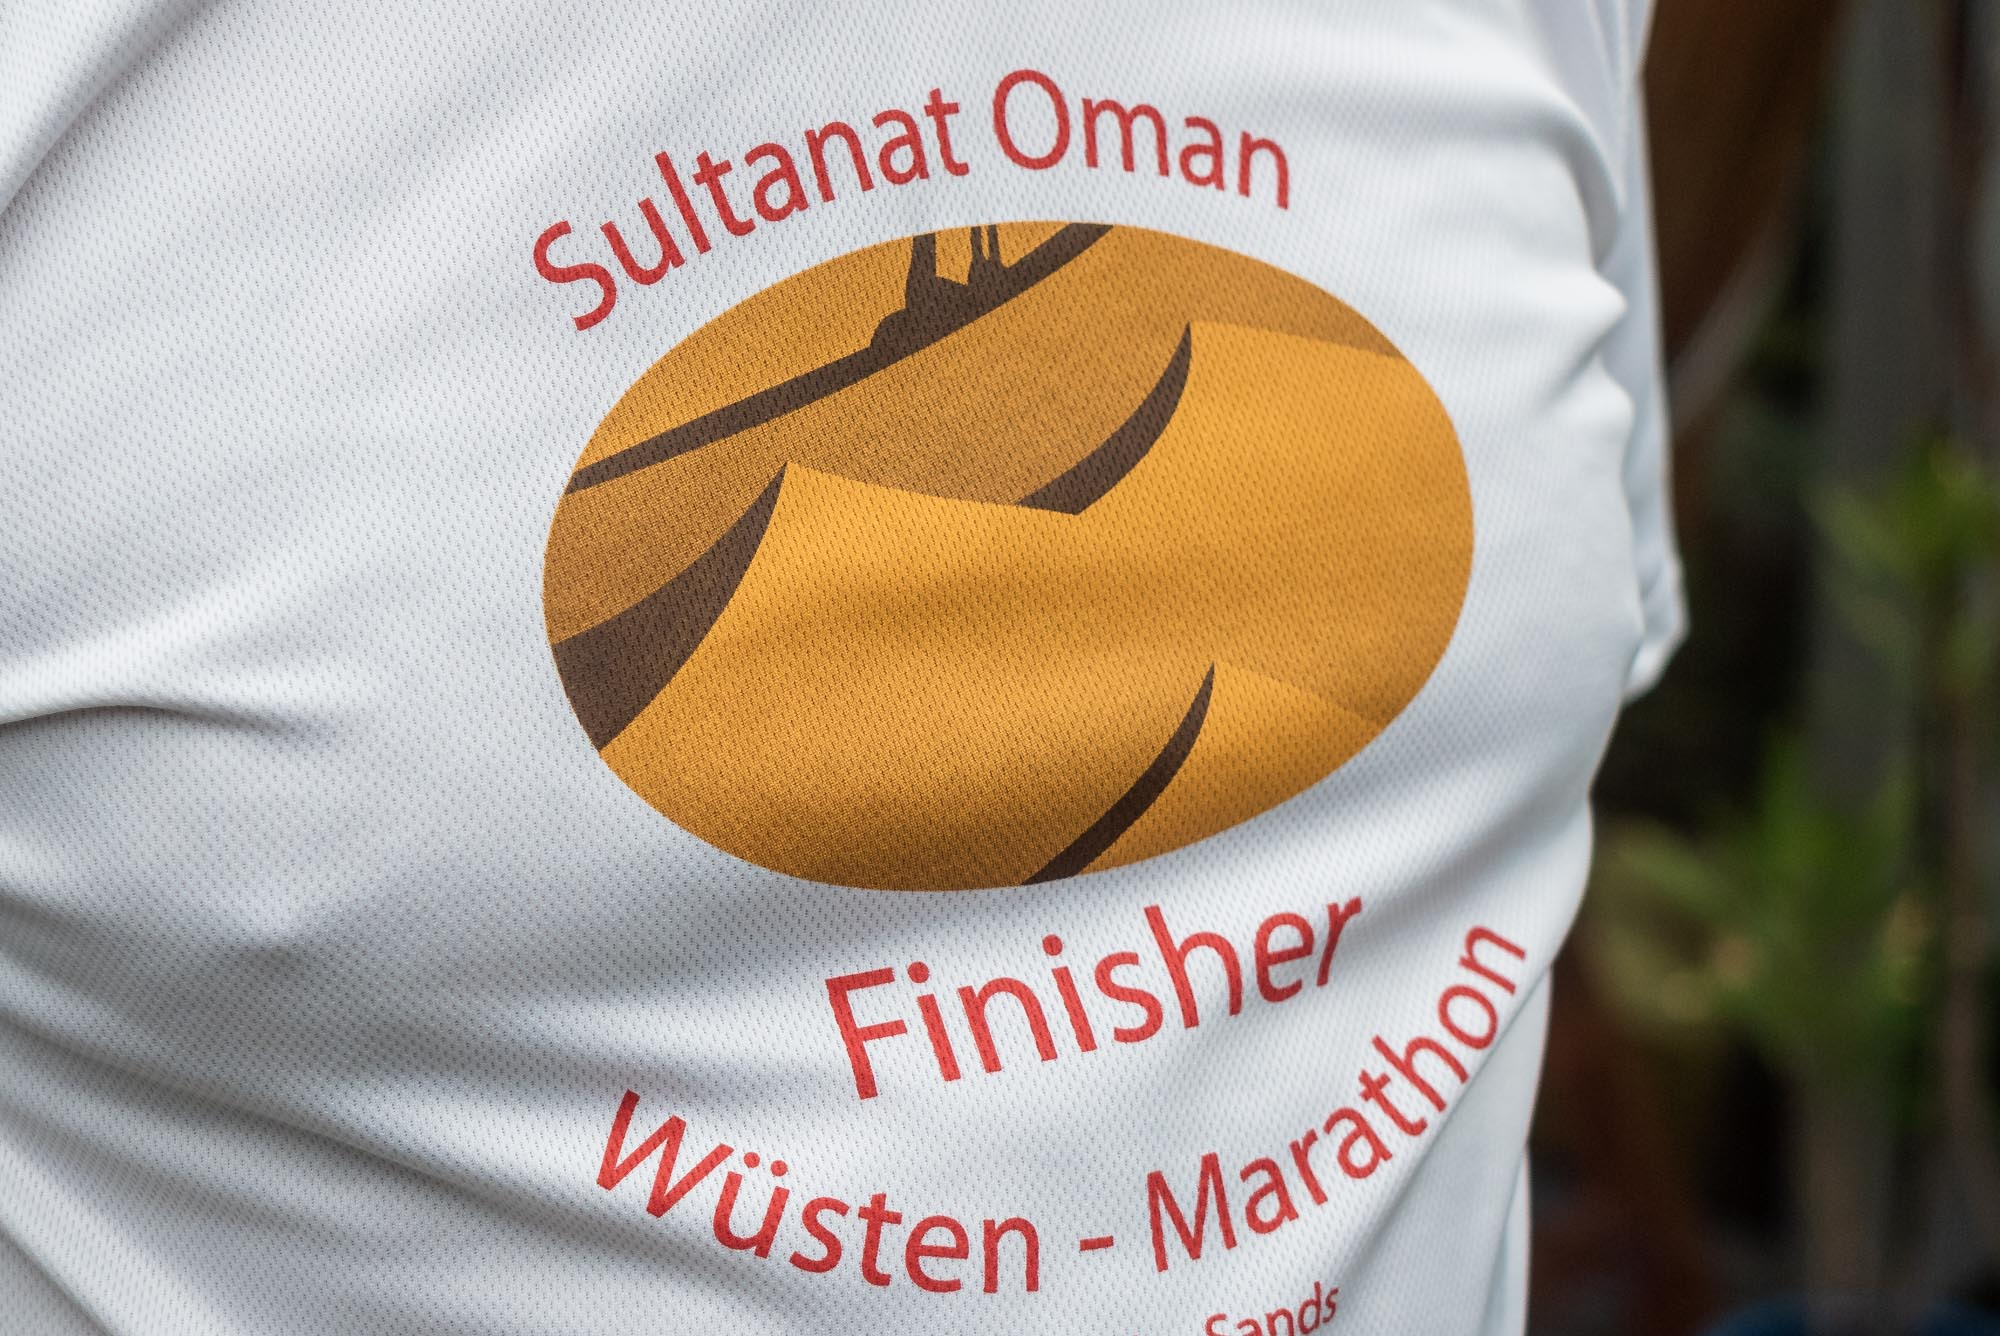 Finisher t-Shirt Oman